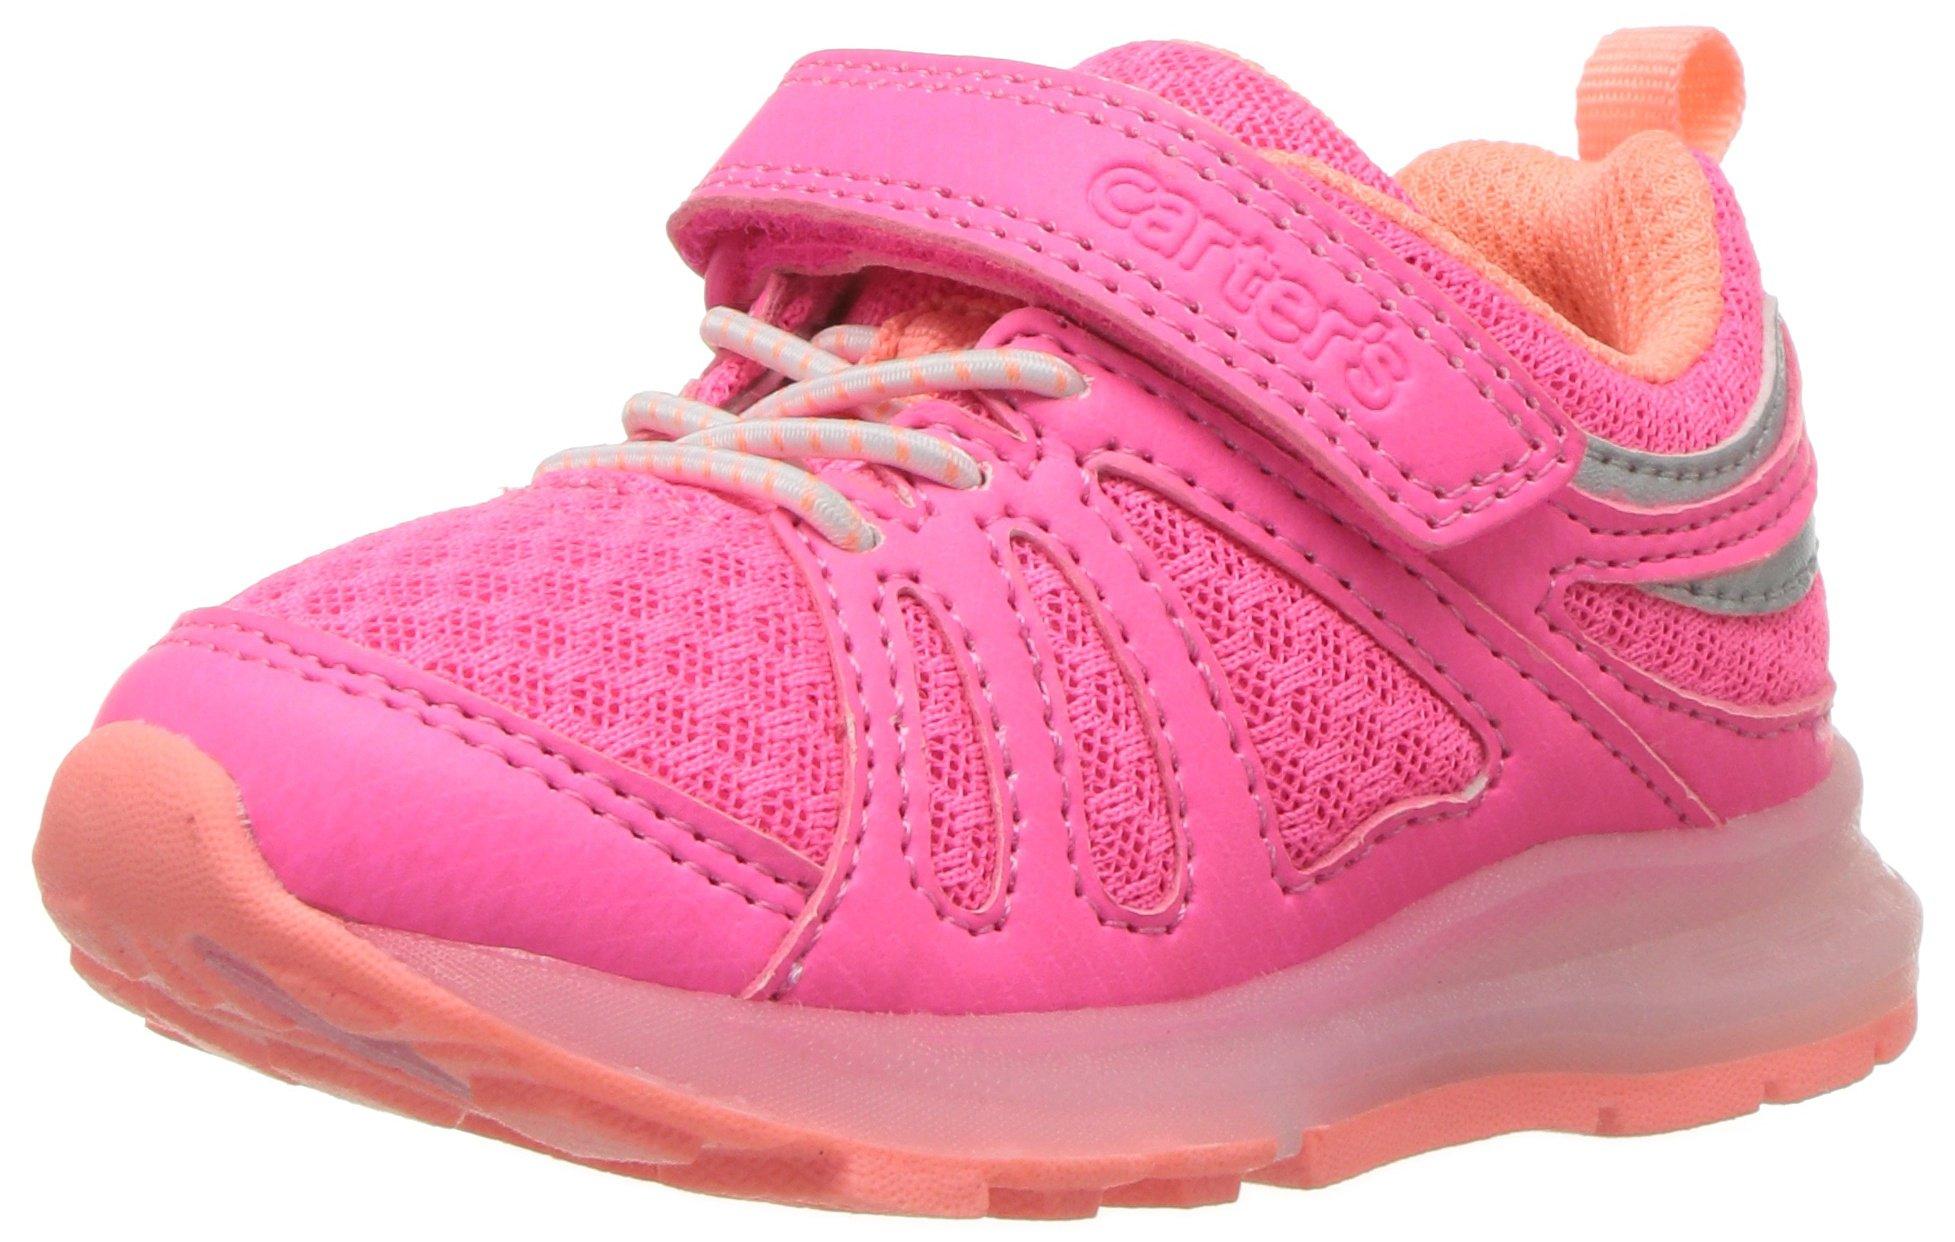 Carter's Unisex-Kids Shelby Boy's and Girl's Light Sneaker, Pink, 11 M US Little Kid